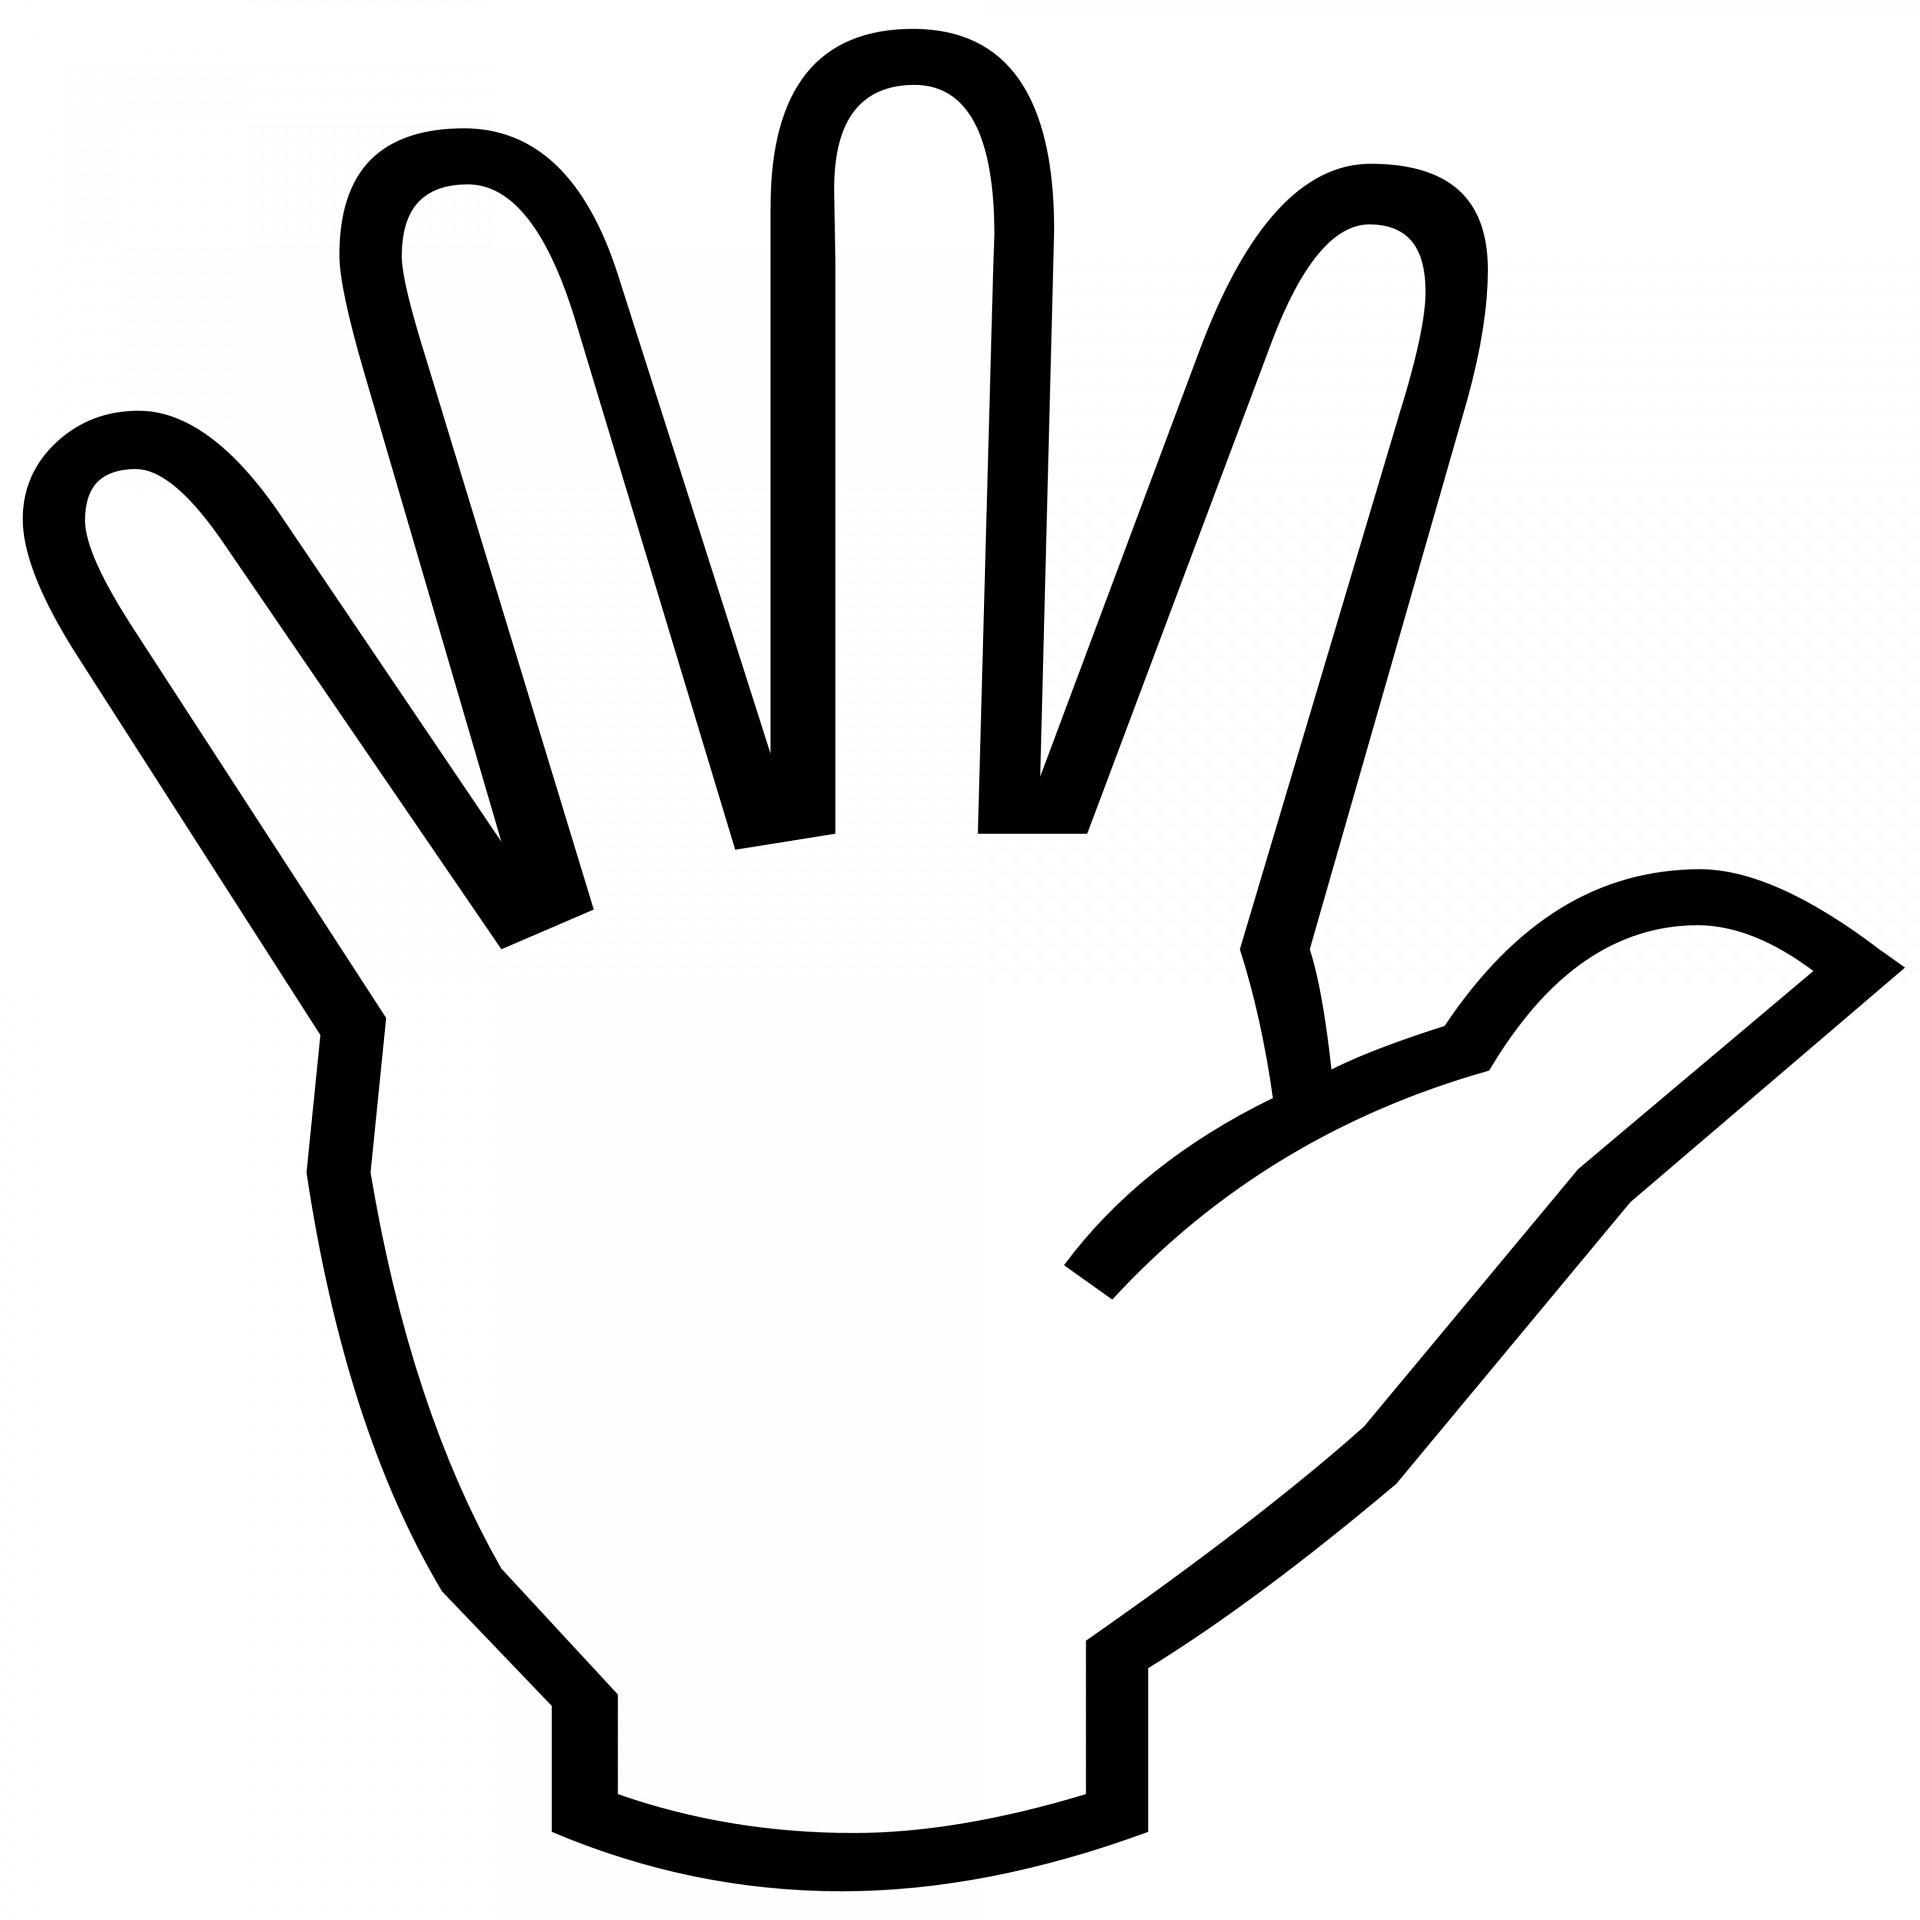 1920x1920 Hand Symbol Silhouette Free Stock Photo